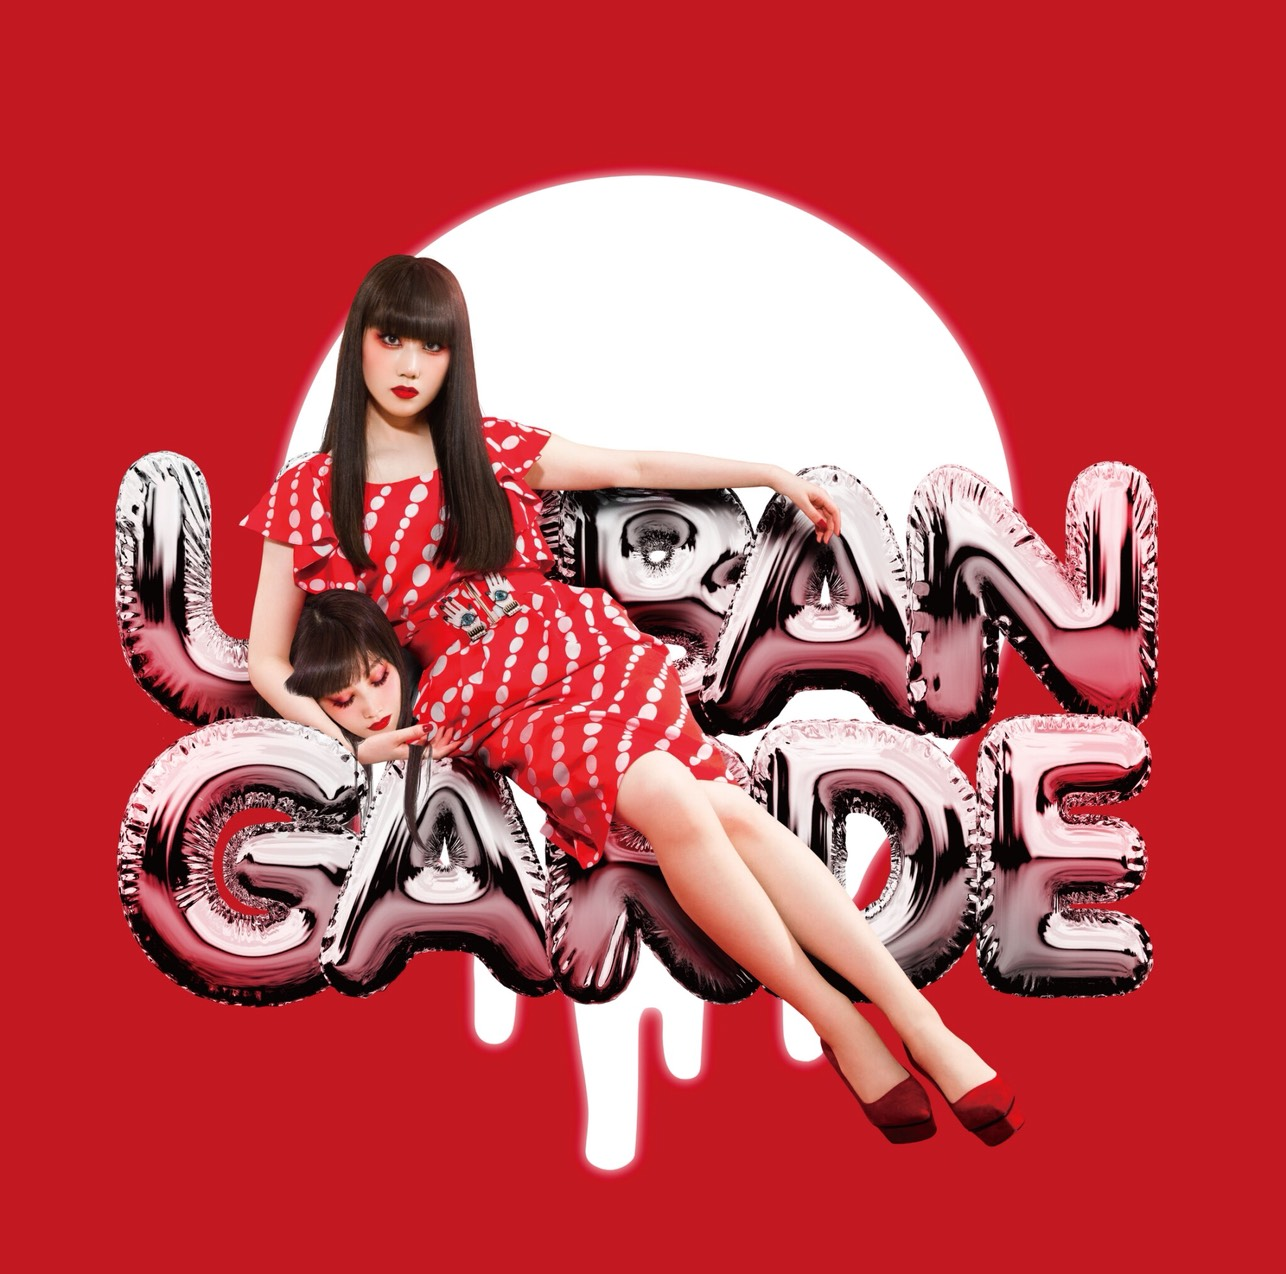 RMMS-URBANGARDE-Ai-to-Gensou-no-URBANGARDE-Limited-Yoko-Hamasaki